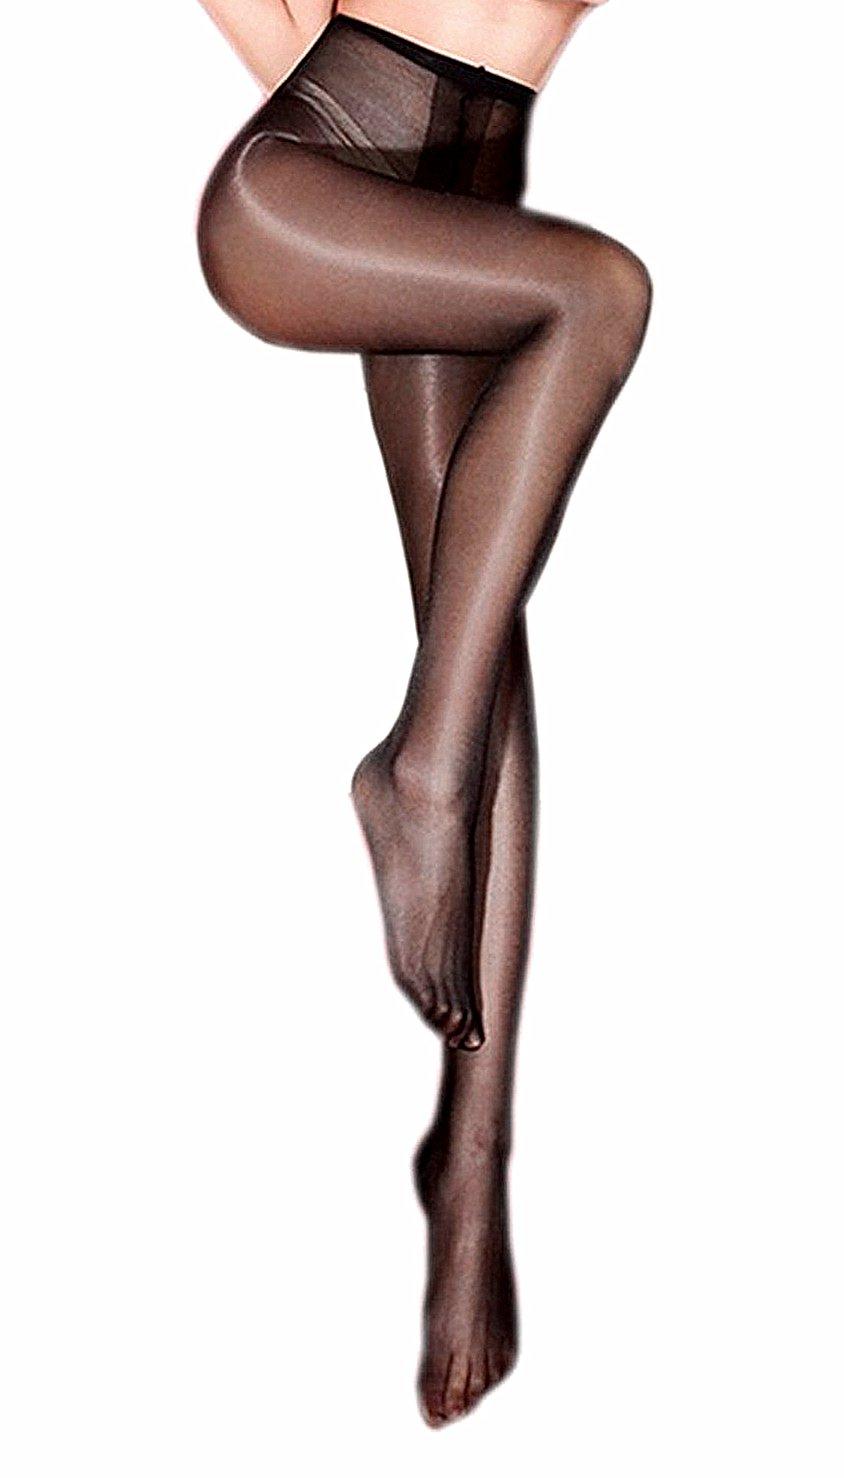 Kffyeye Sheer Pantyhose High Waist Open Crotch Tights Shiny Silk Stockings, Ultra Shimmery Plus Footed 30D Tights (1pcs Black)